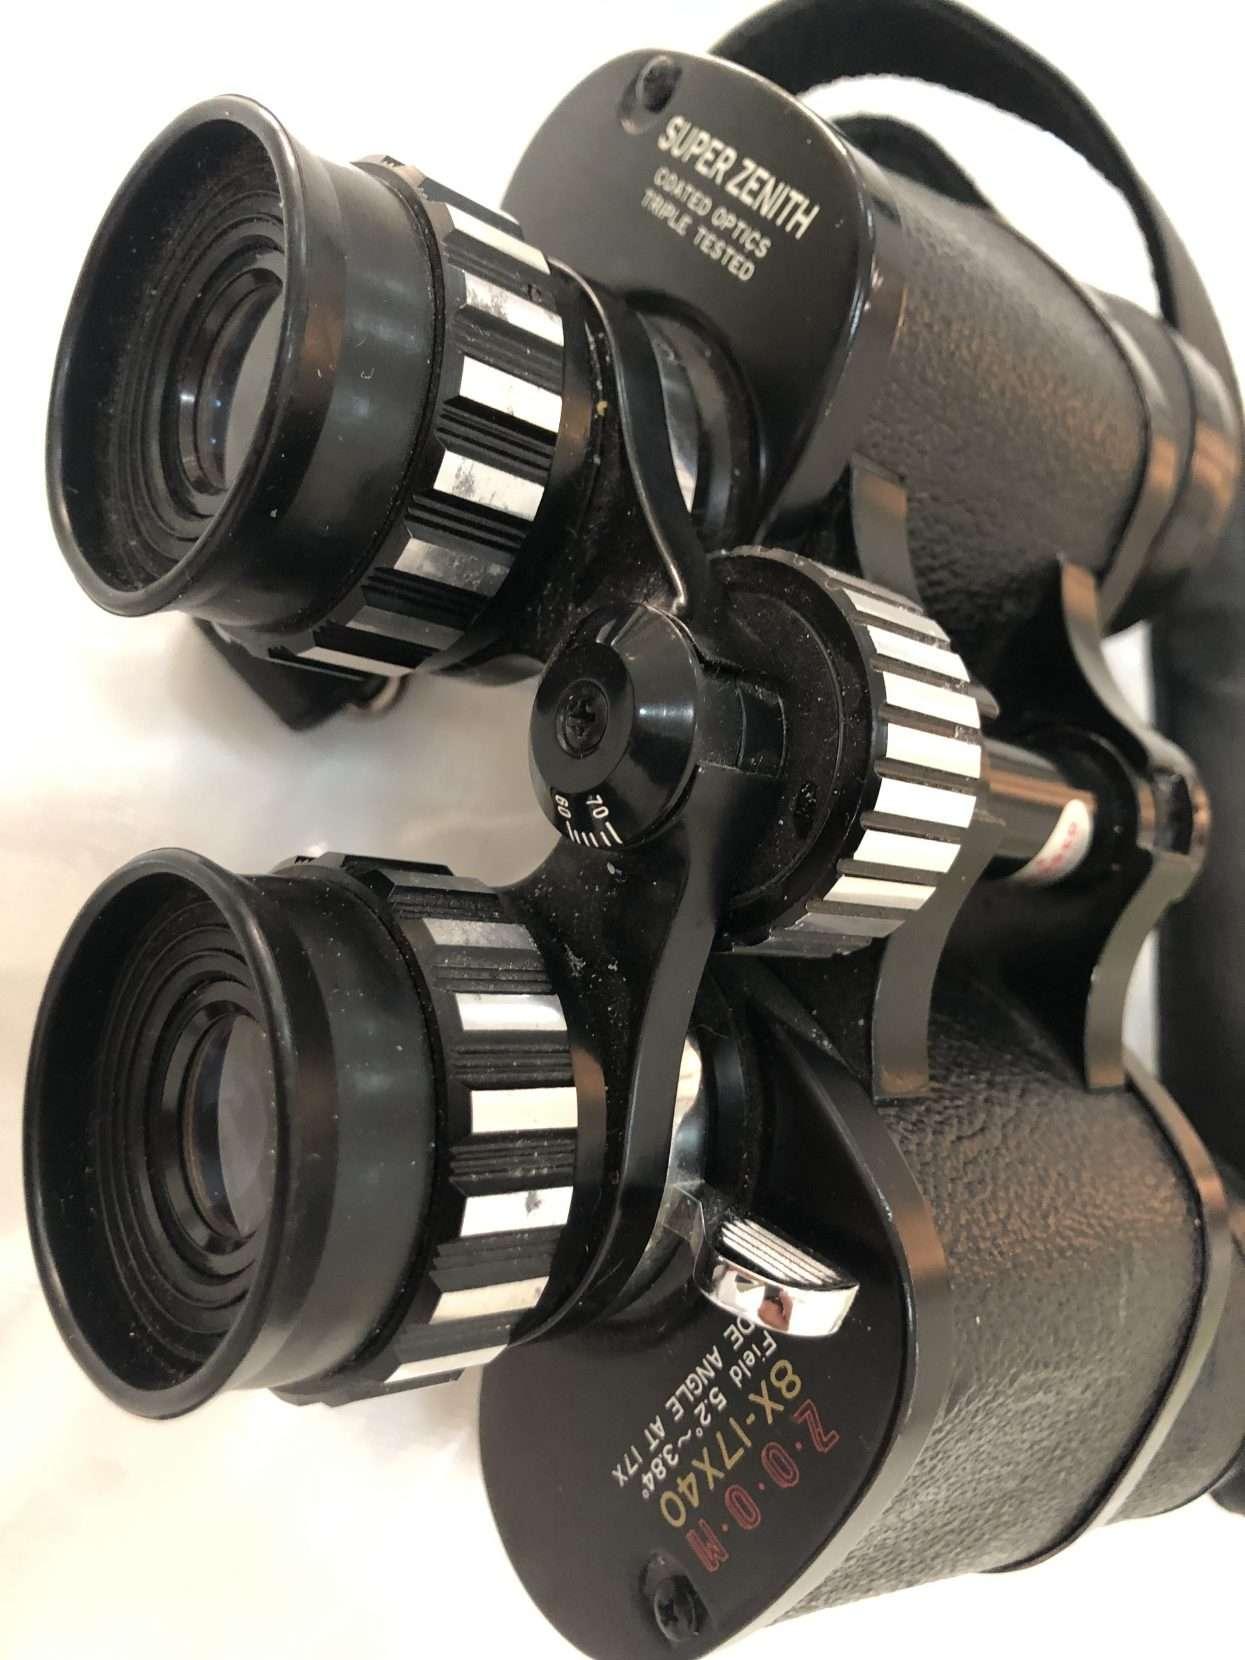 FujiFilm Binoculars